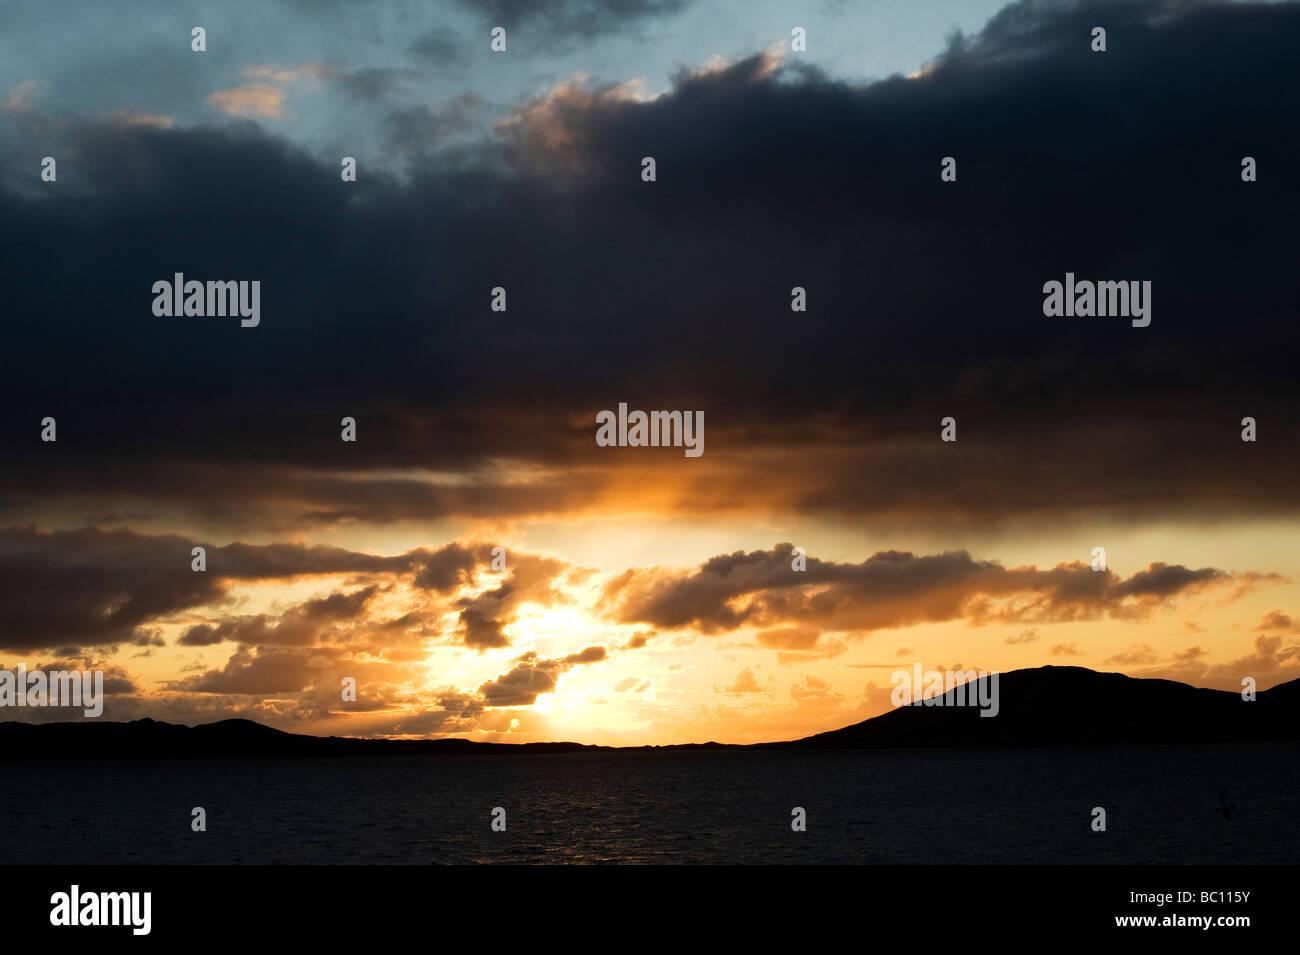 Sunset over Sound of Taransay , Isle of Harris, Outer Hebrides, Scotland - Stock Image